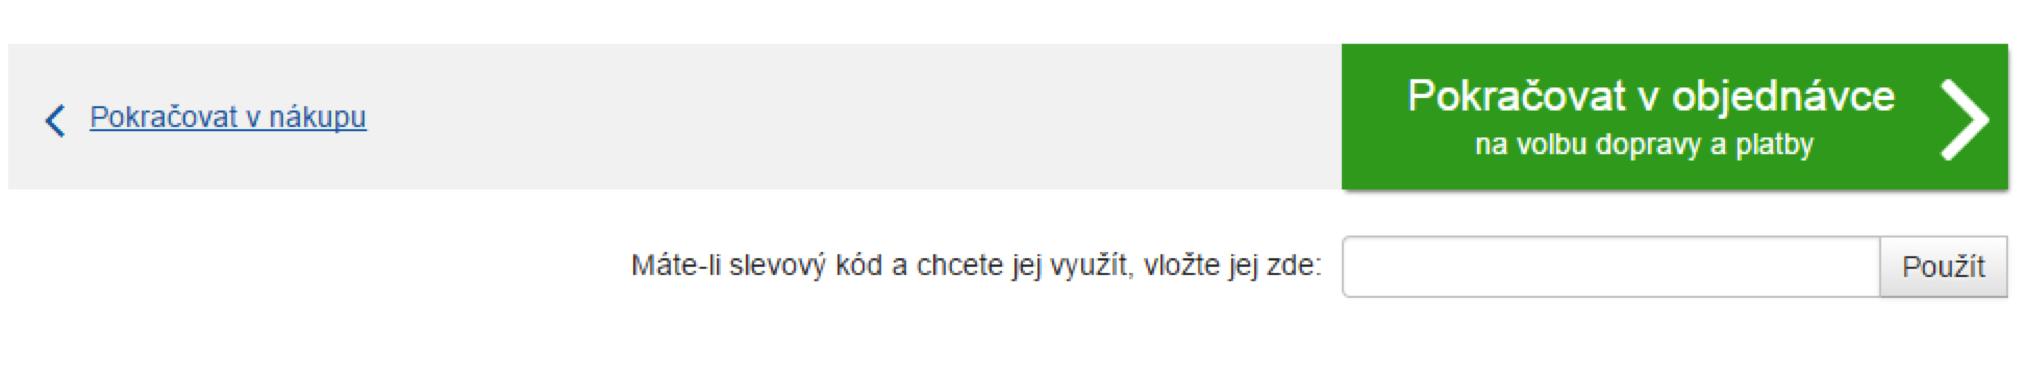 slevomat2